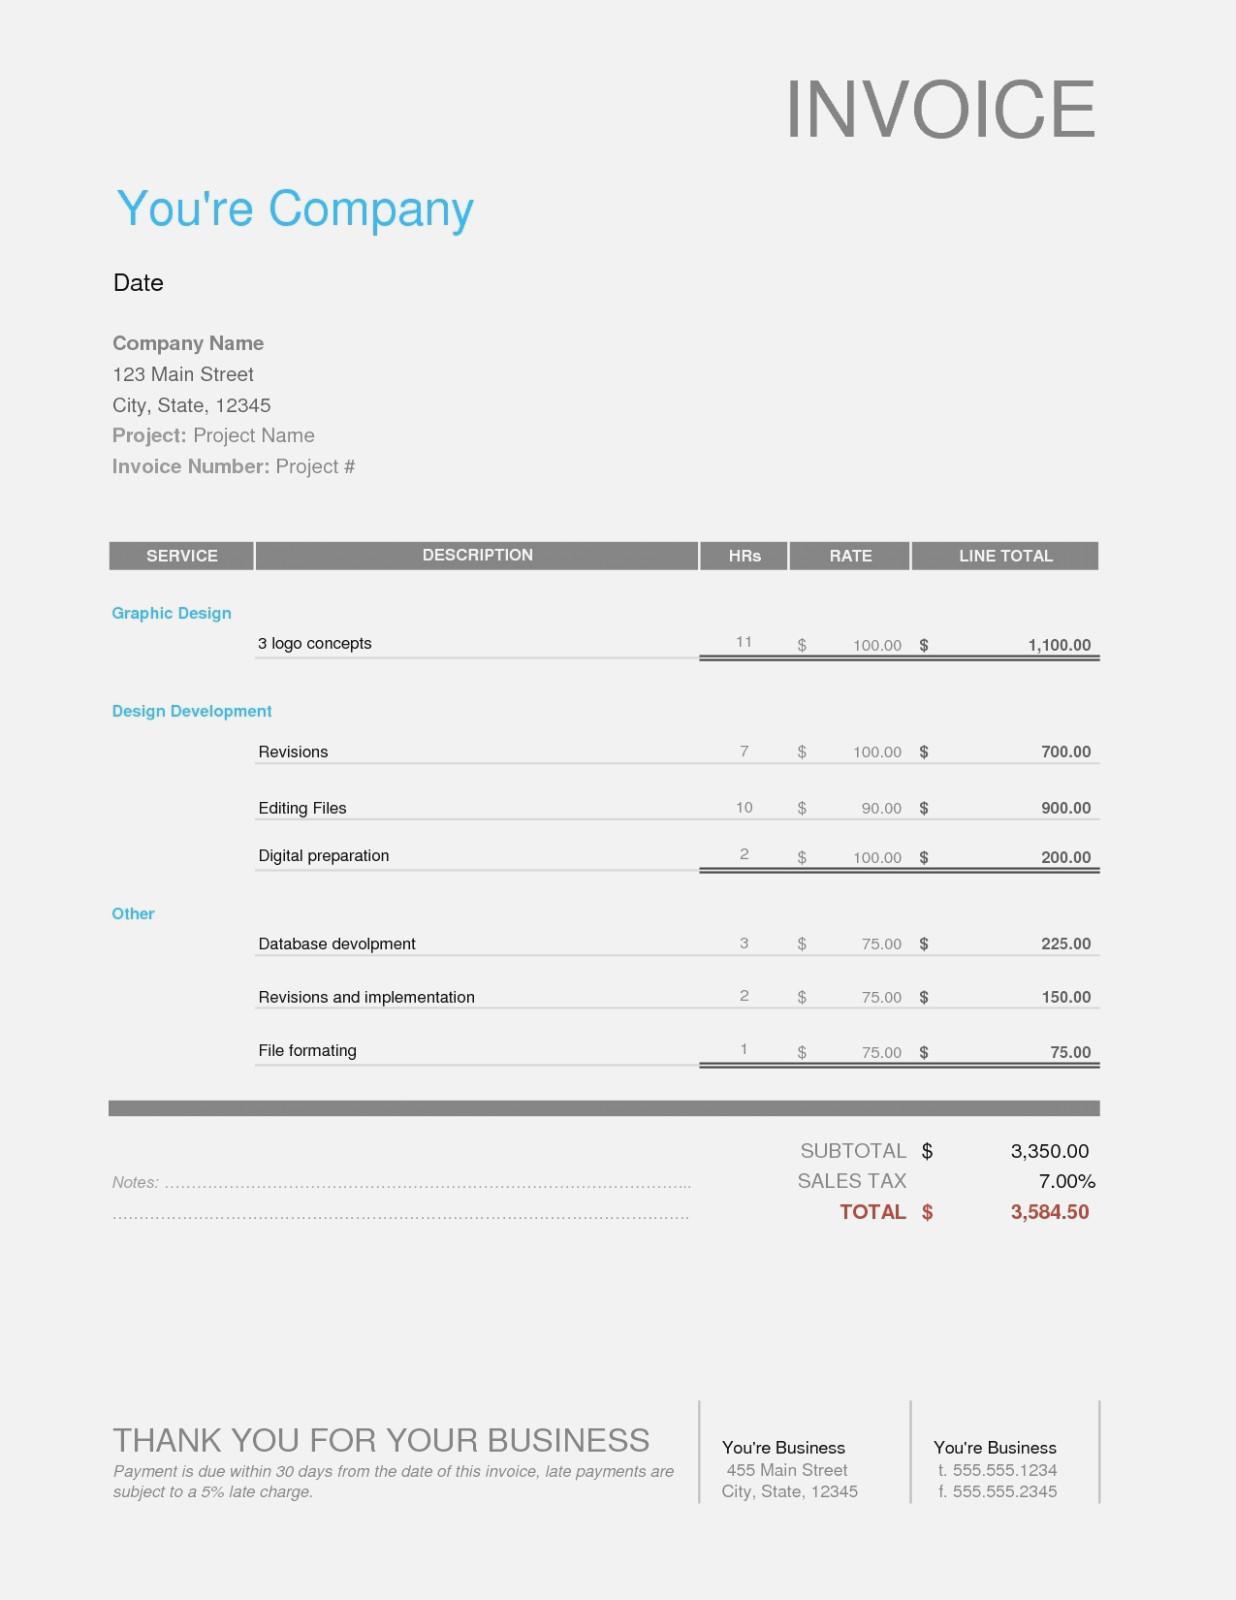 Freelance Graphic Design Invoice Templates